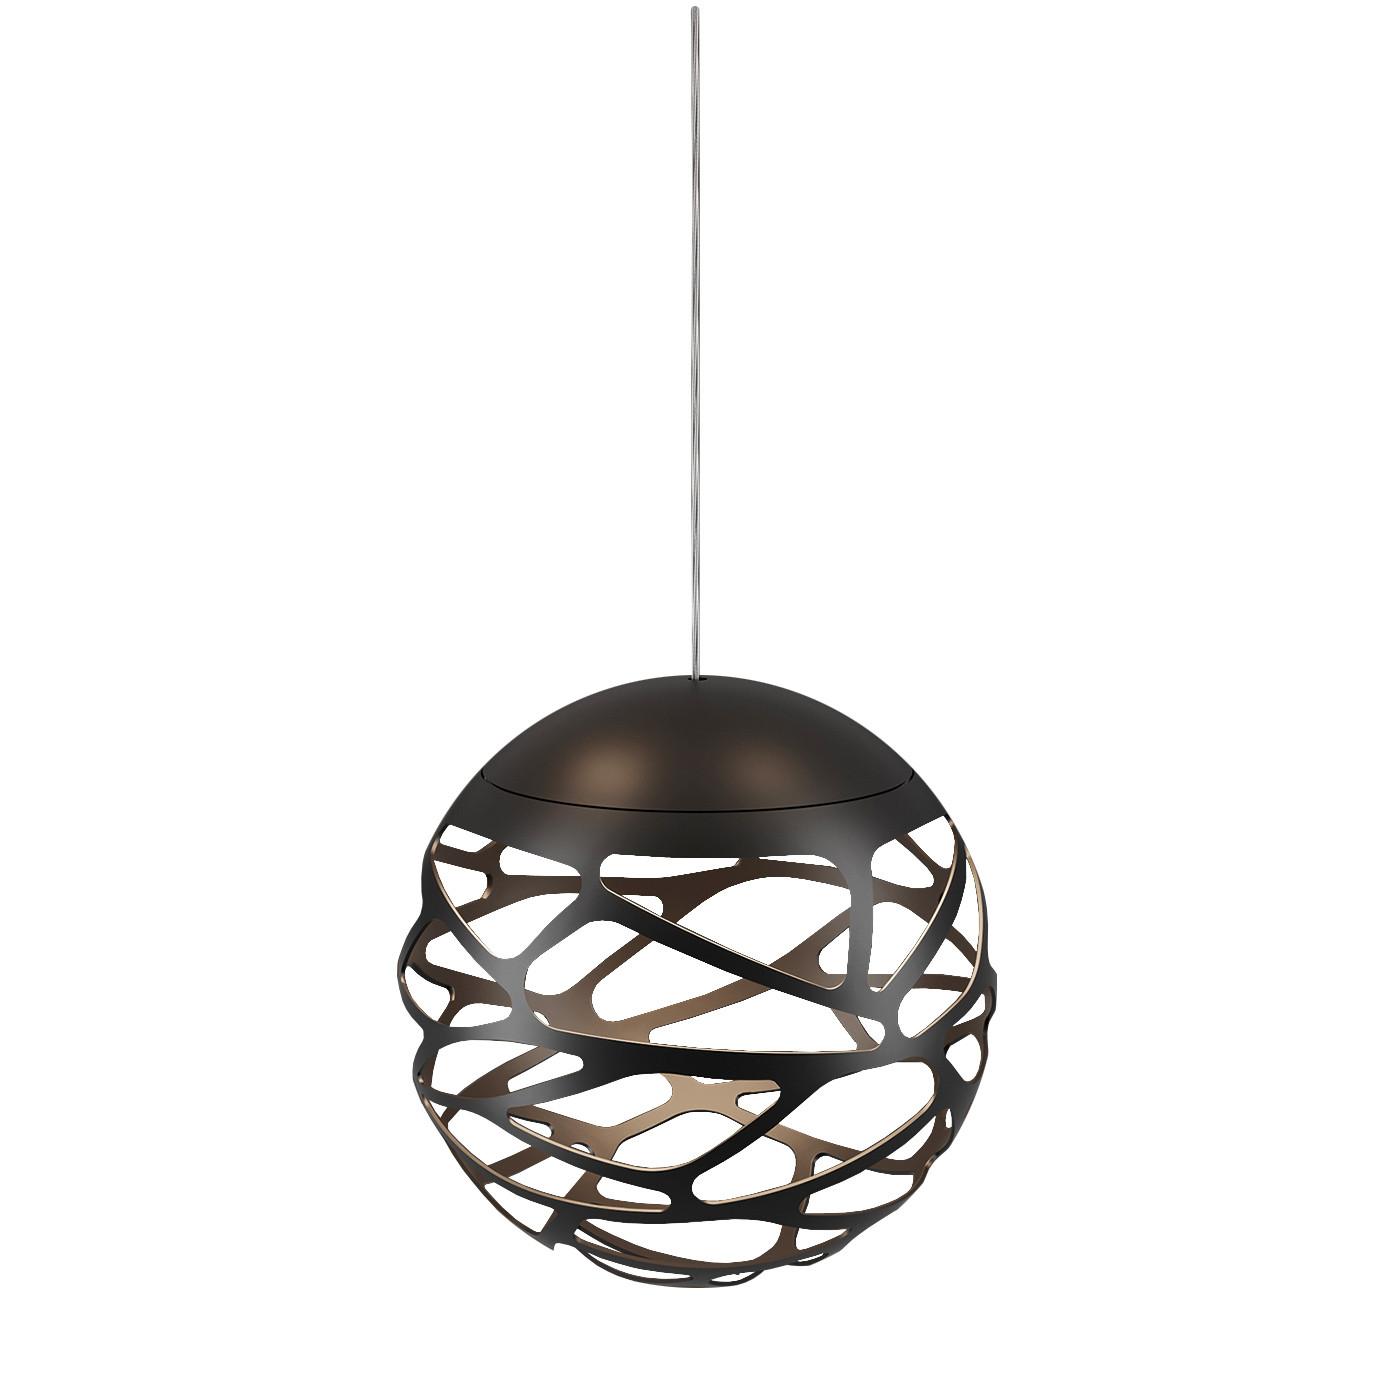 Studio Italia Design Kelly Cluster Sphere